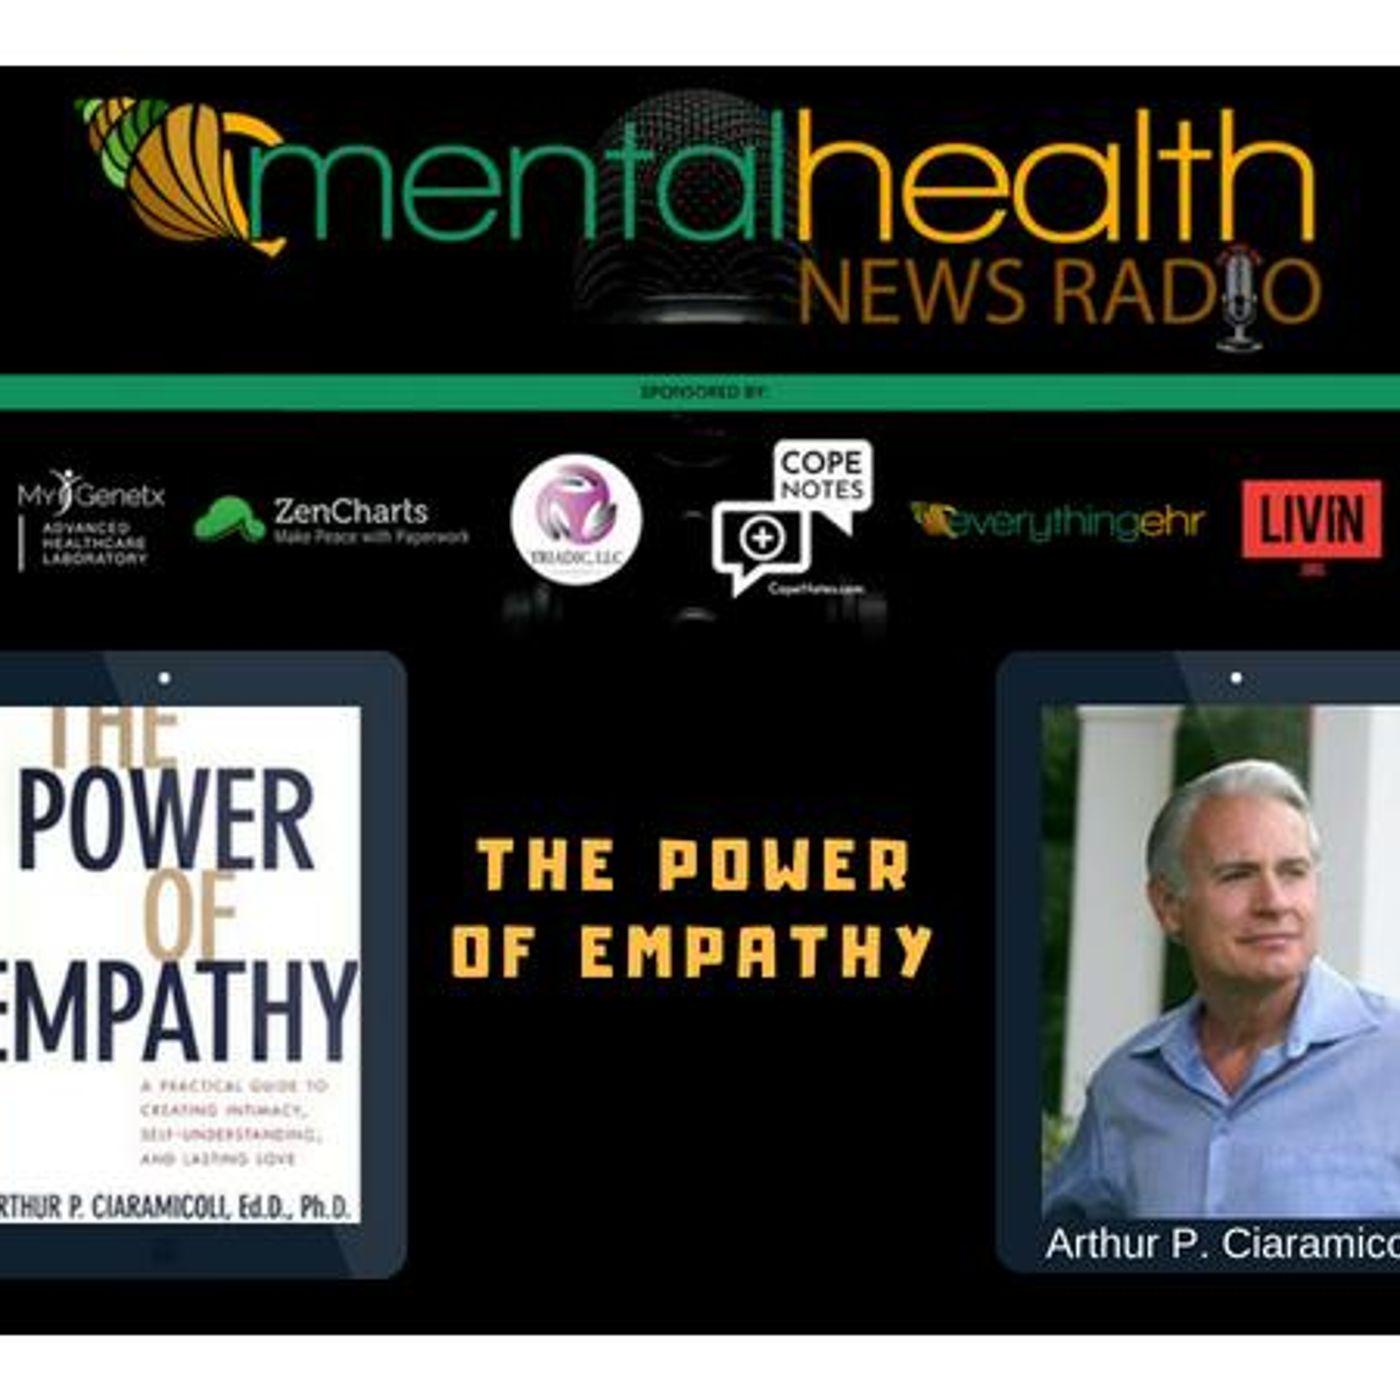 Mental Health News Radio - The Power of Empathy with Arthur P. Ciaramicoli, Ed.D., Ph.D.